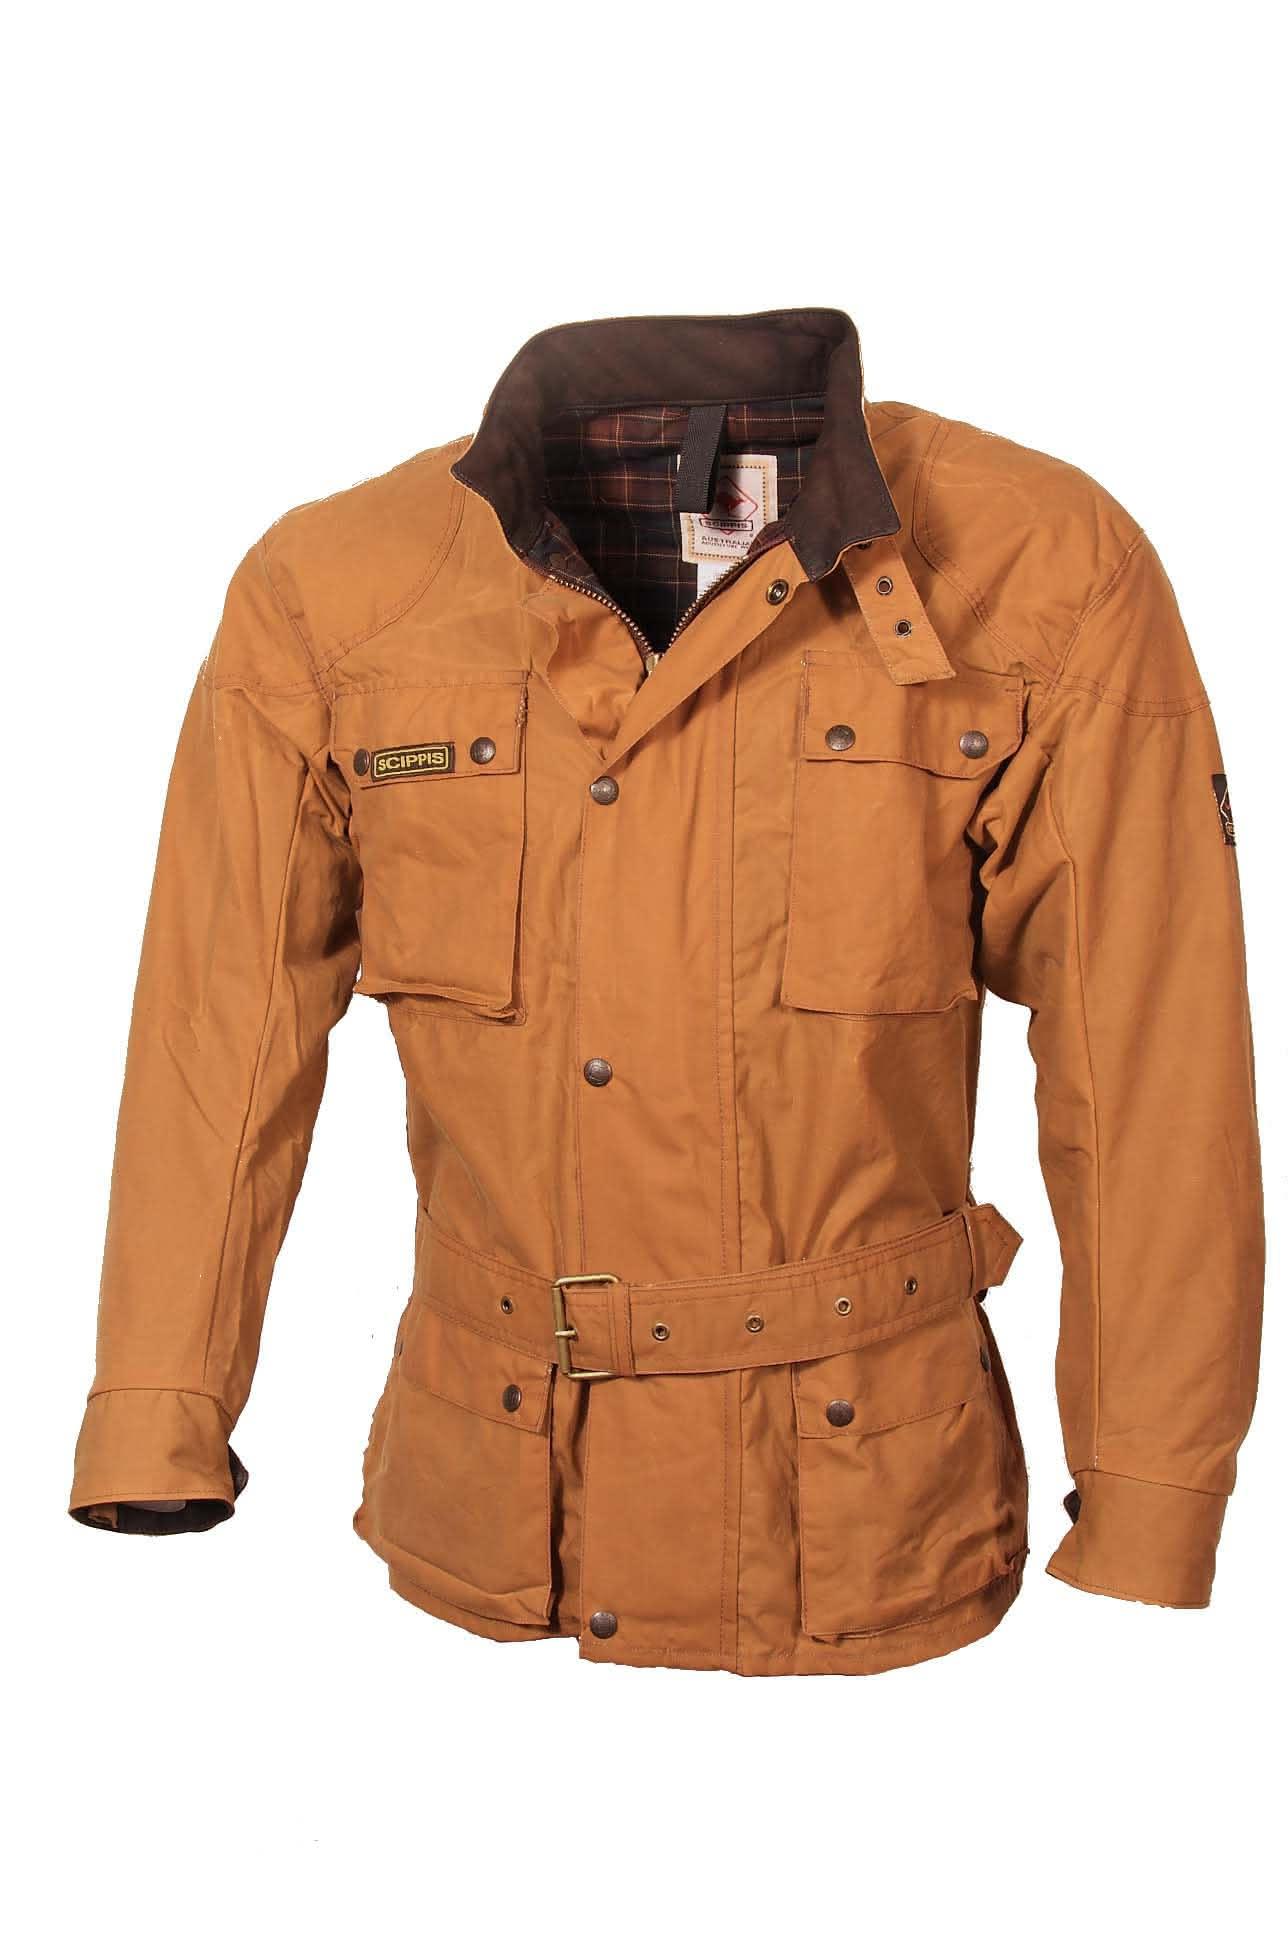 Scippis Belmore Jacket - 2J16 - Tan-XL